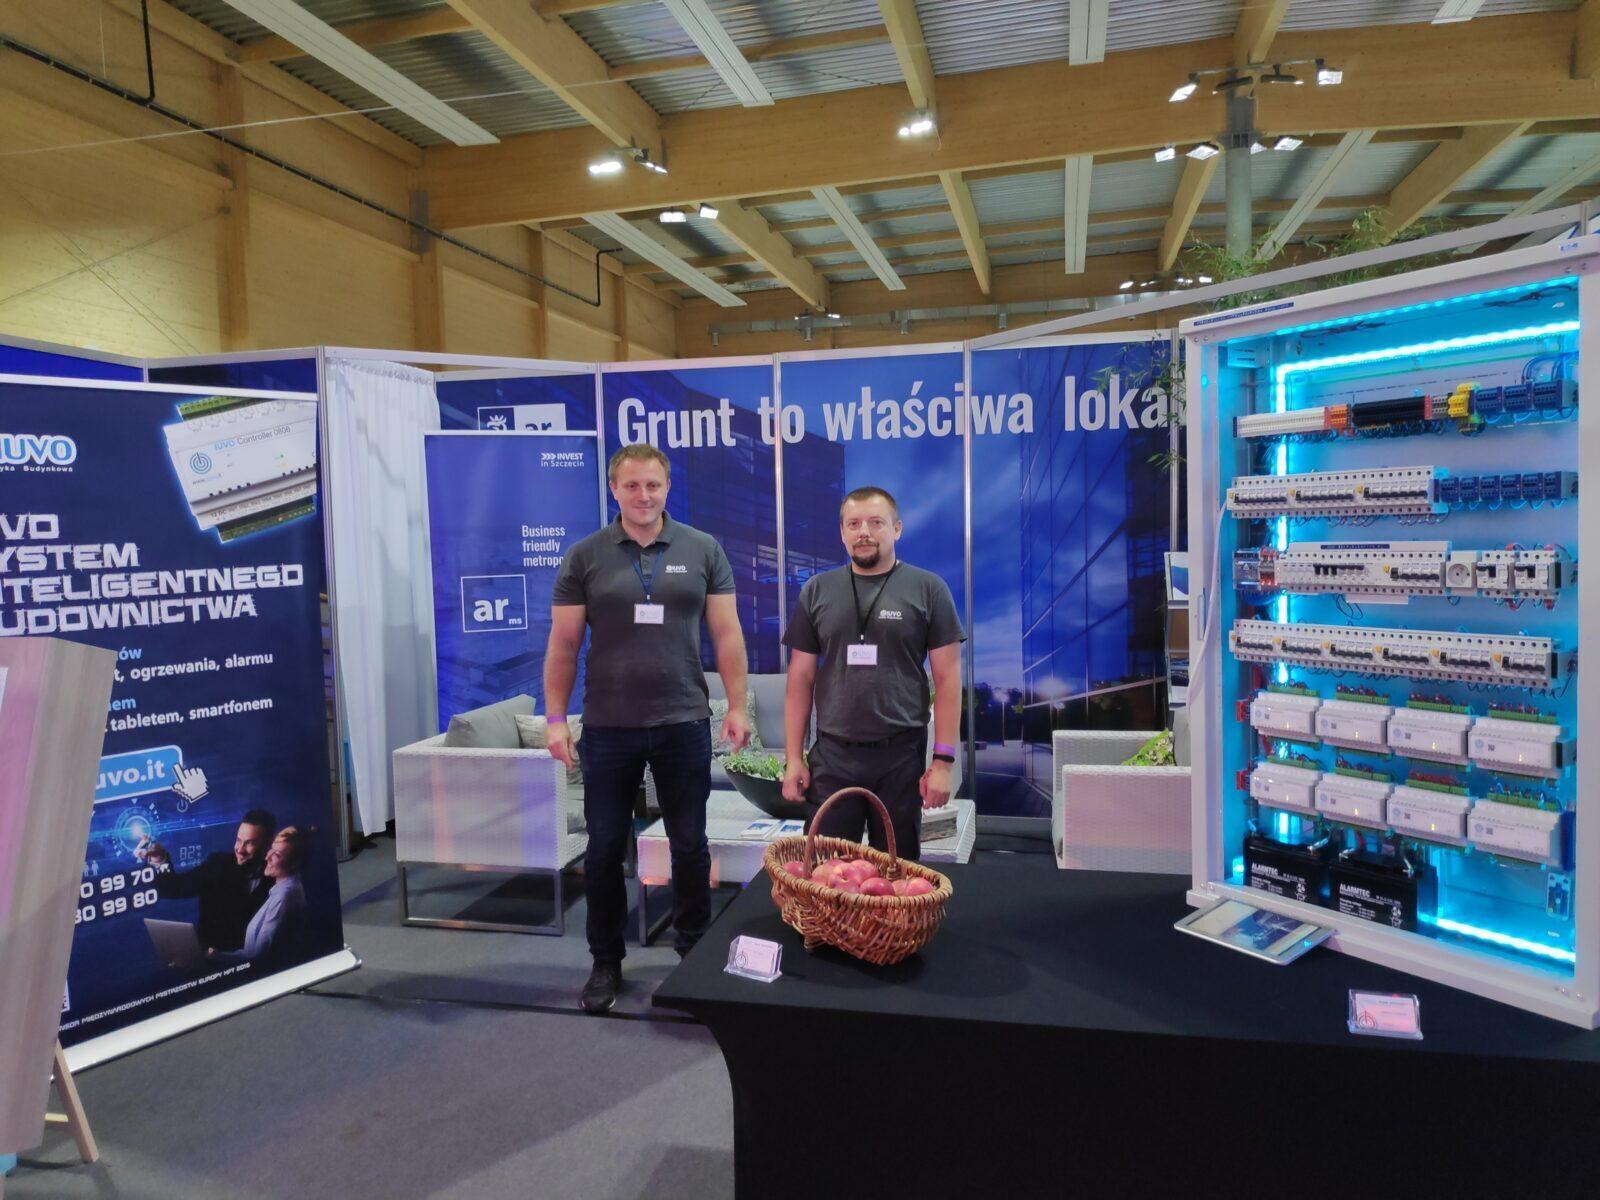 Stoisko podczas Challenger ATP Pekao Szczecin Open 2019